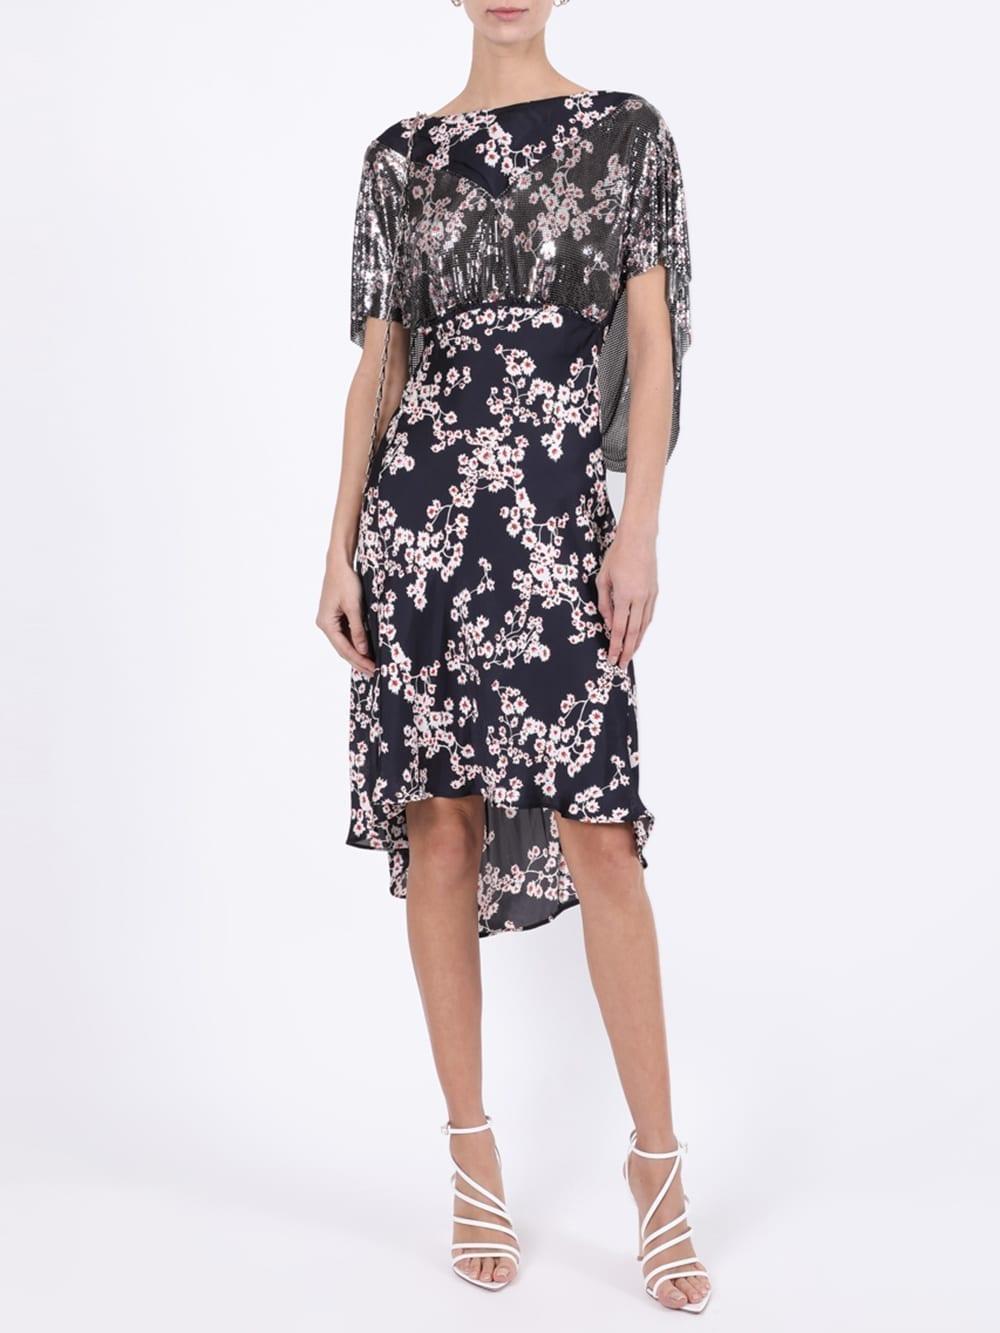 PACO RABANNE Black Sakura Floral Print Dress